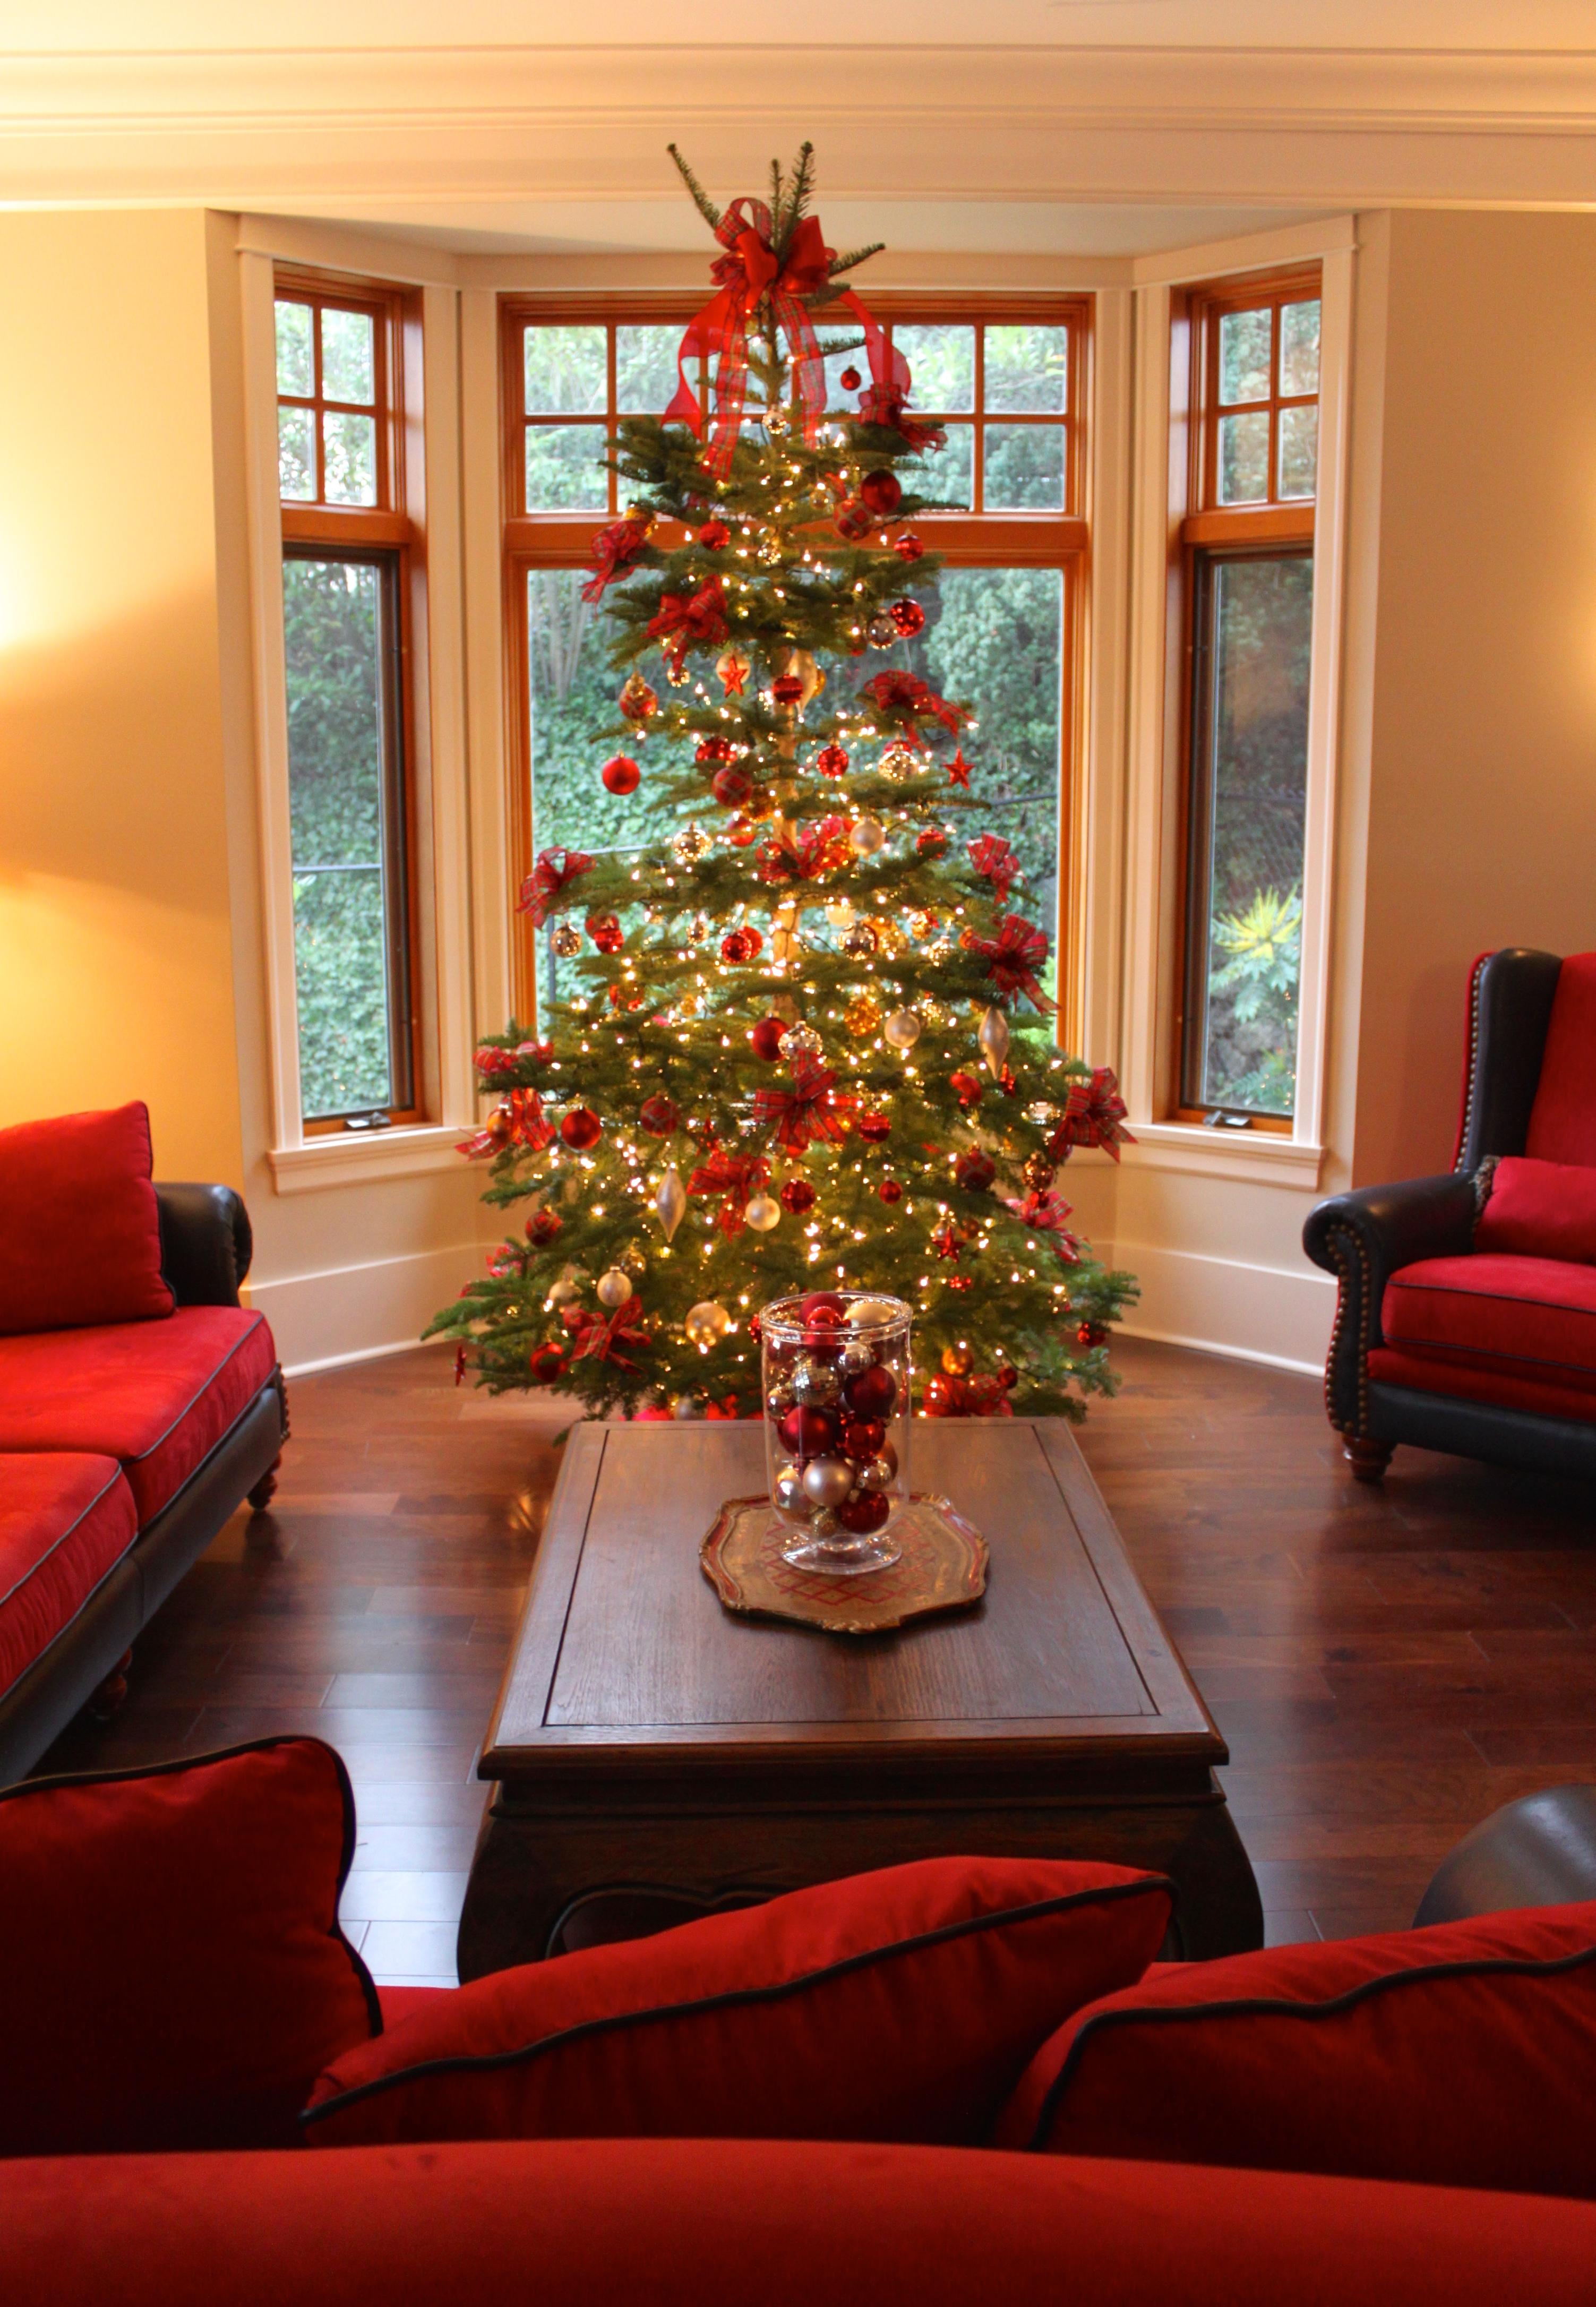 Holiday Decorating Service - Christmas Tree